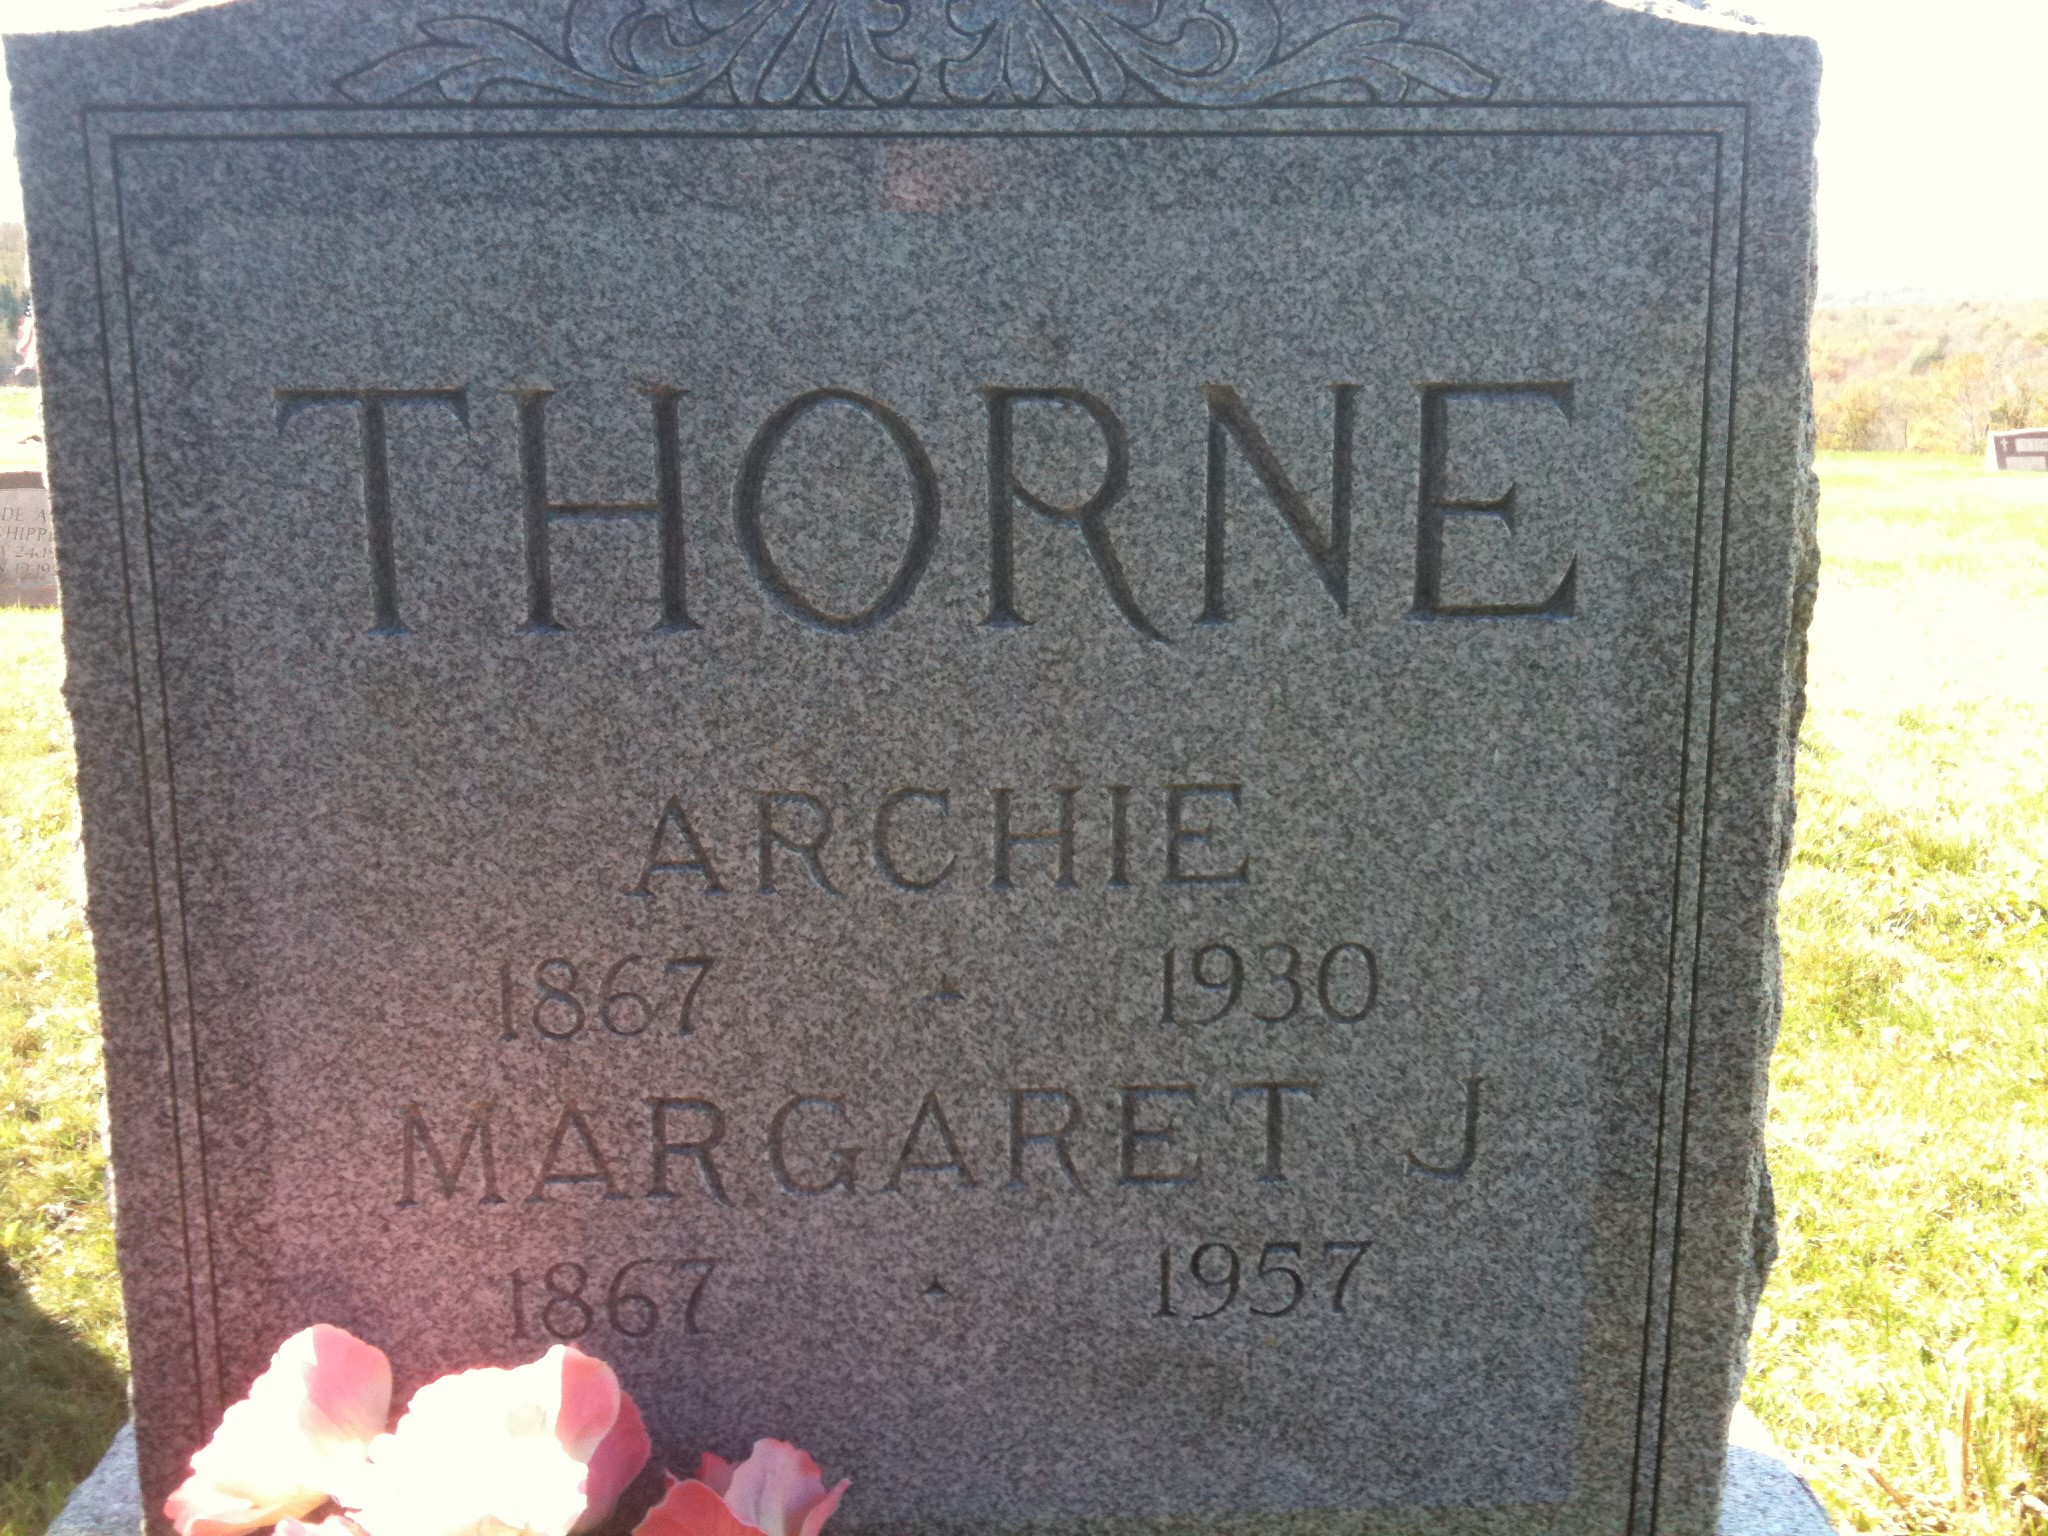 Archie Thorne